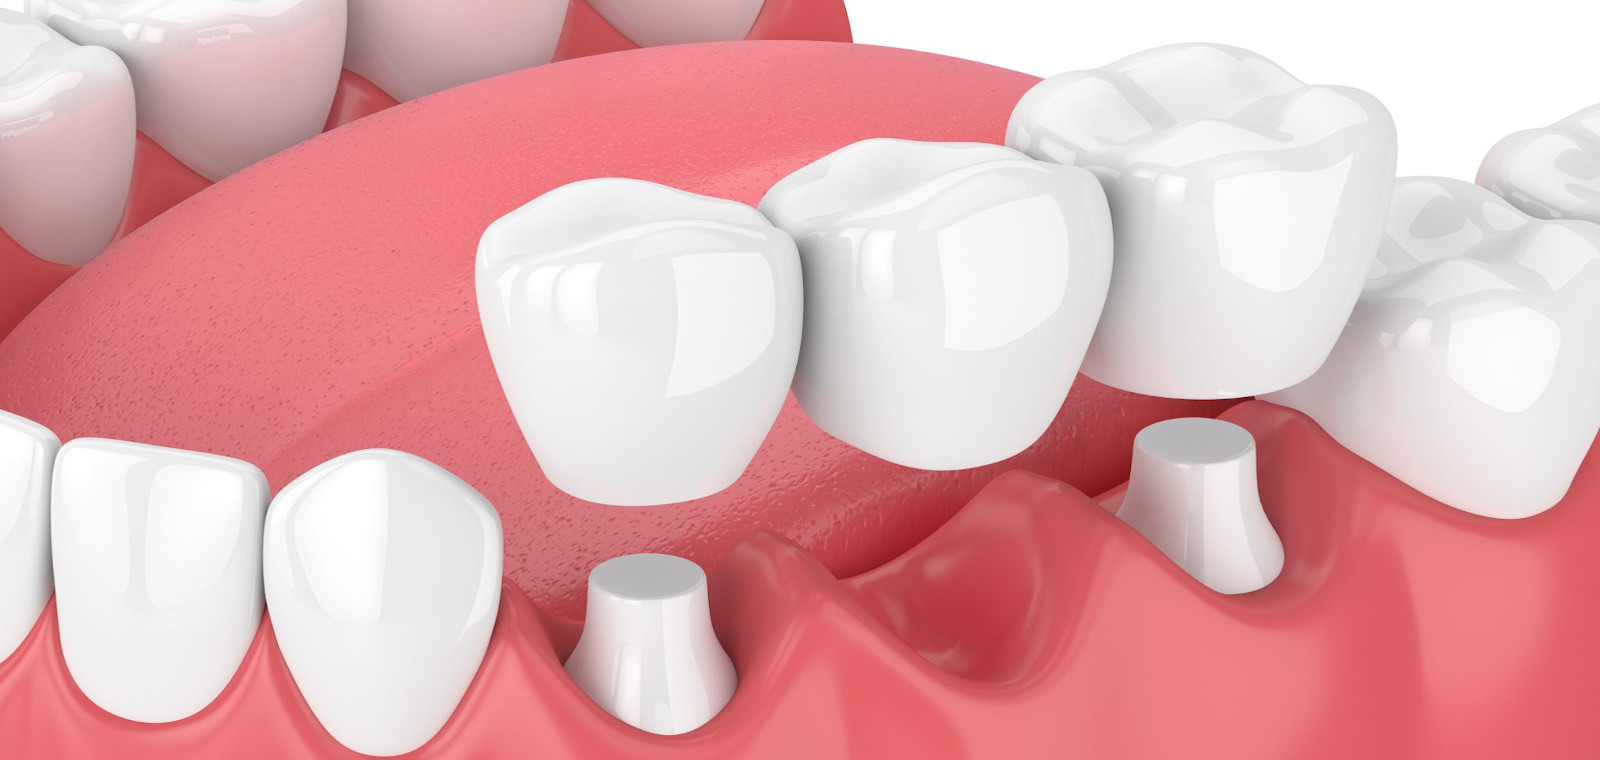 Clinica Dental Mediterrani | Puentes fijos